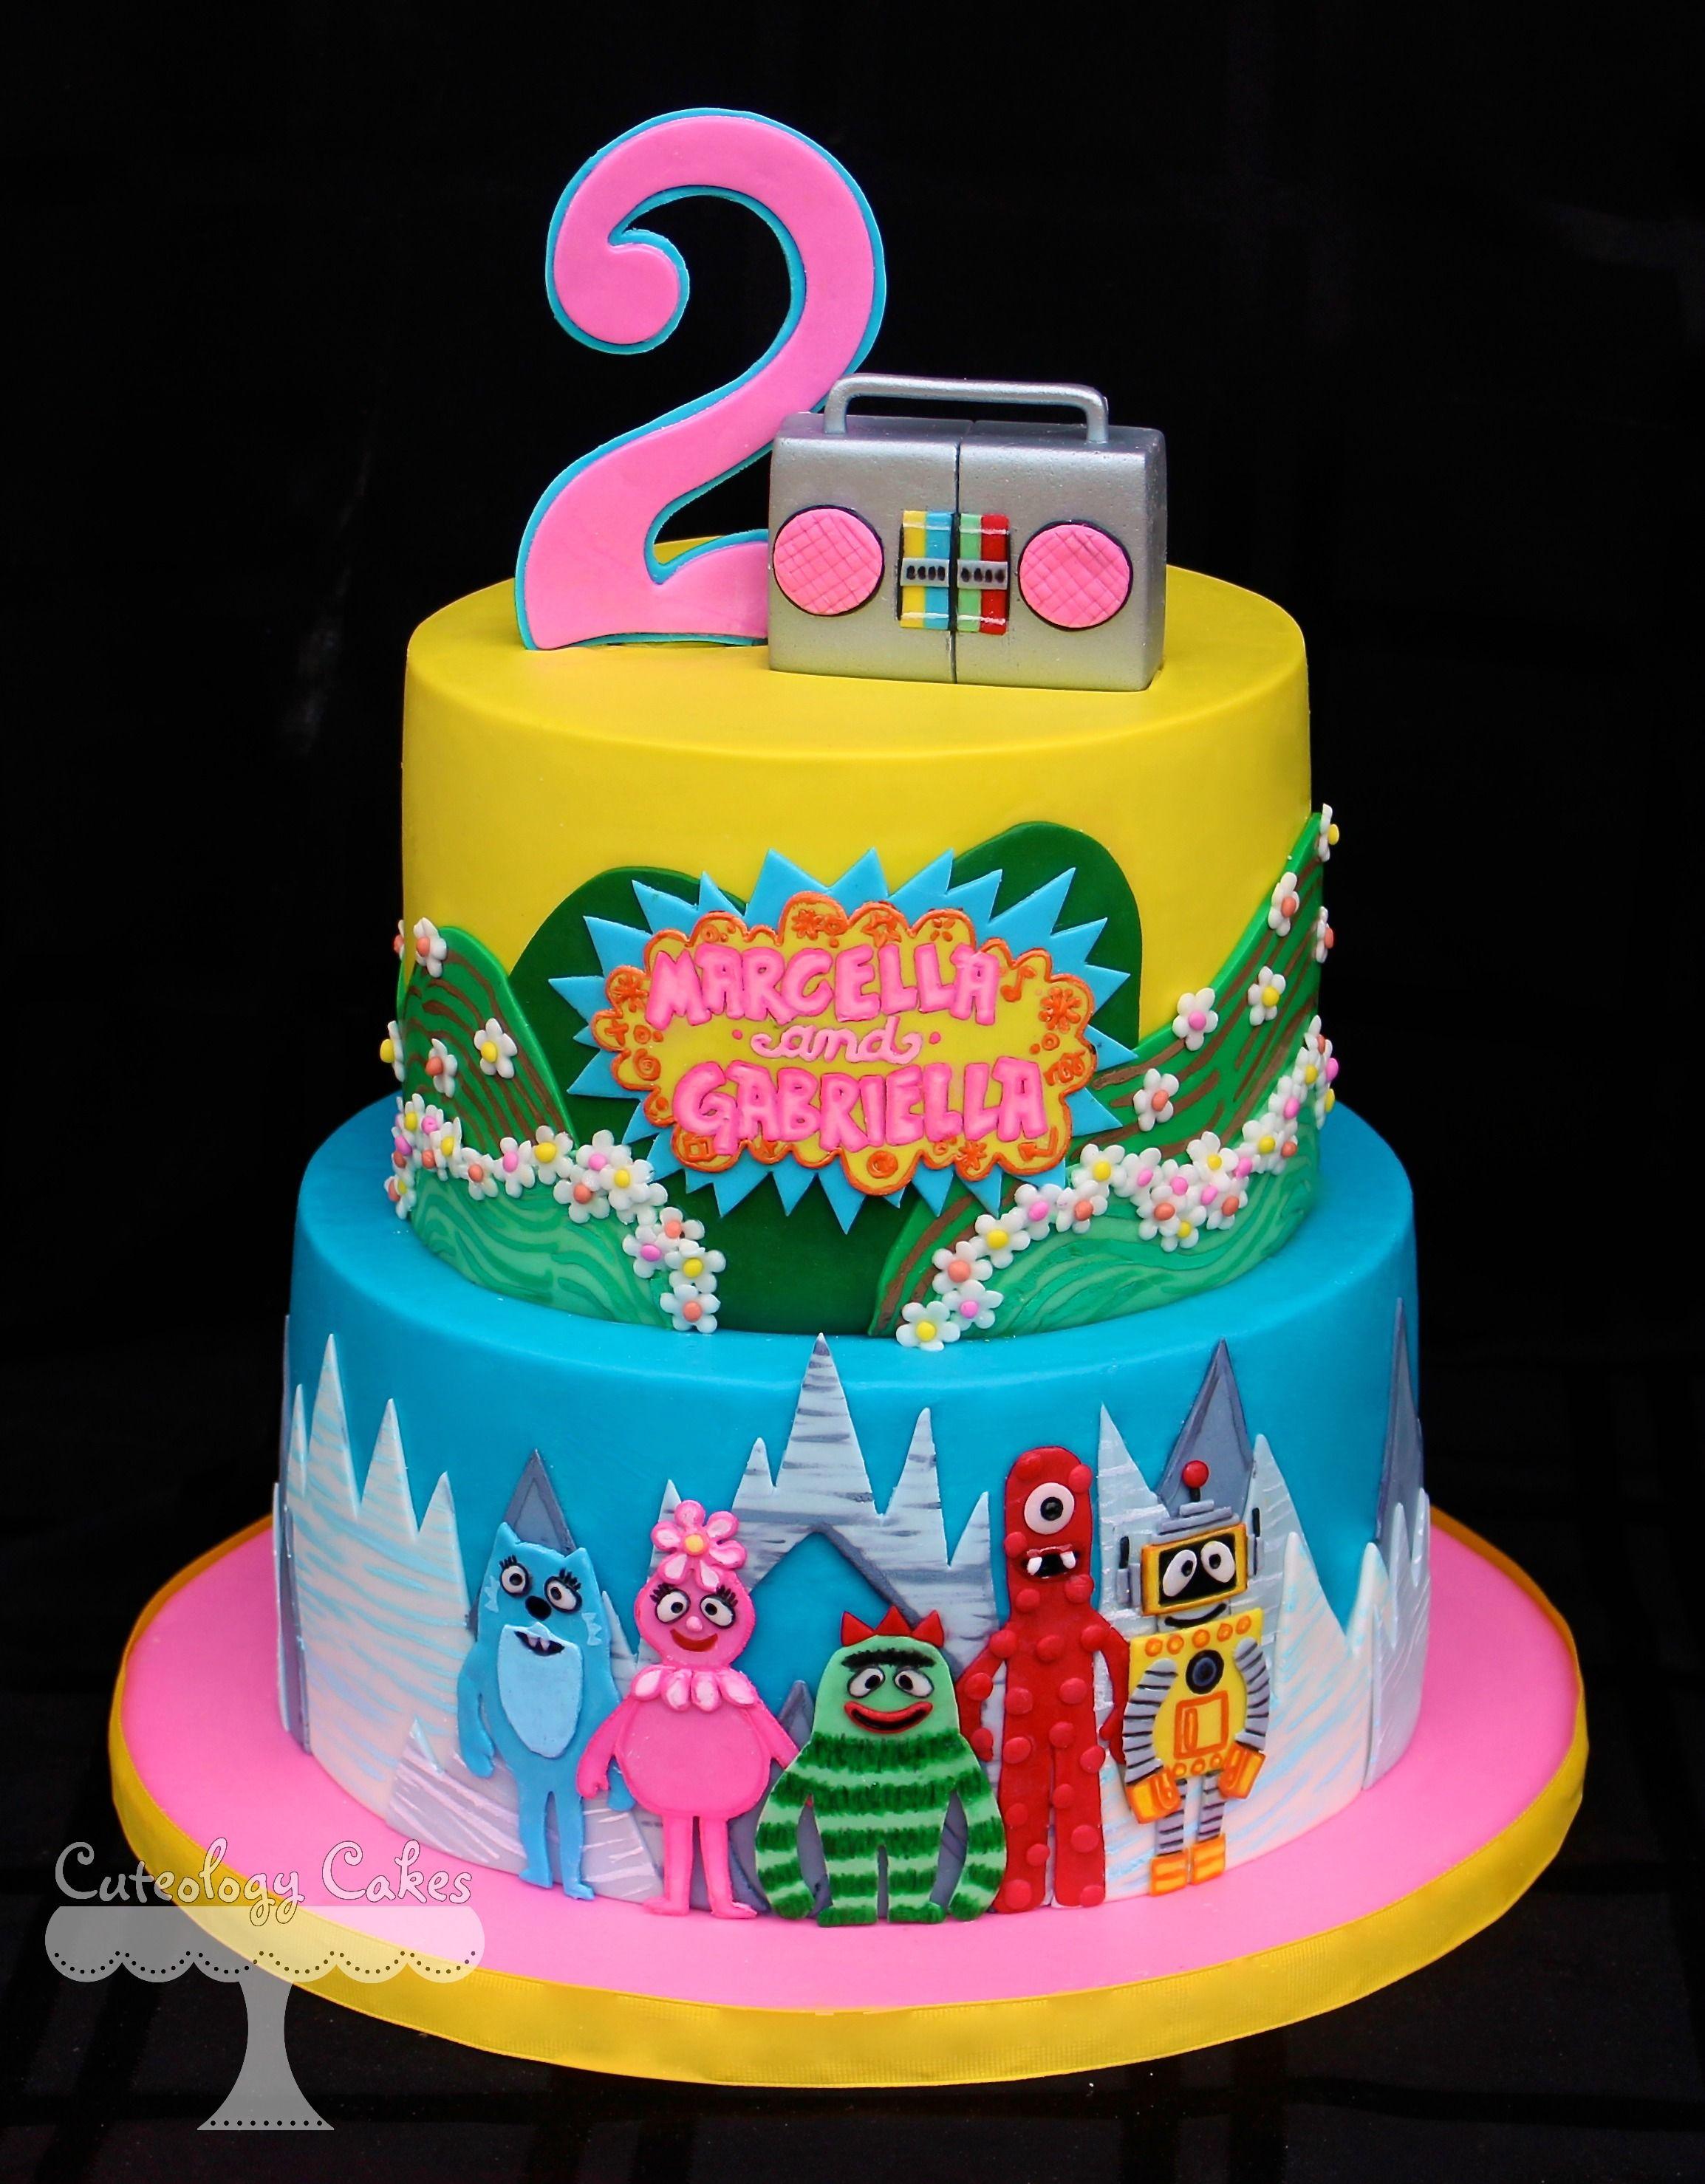 10 Gorgeous Yo Gabba Gabba Cakes Ideas yo gabba gabba cake sweet treats fun cakes festa 2020